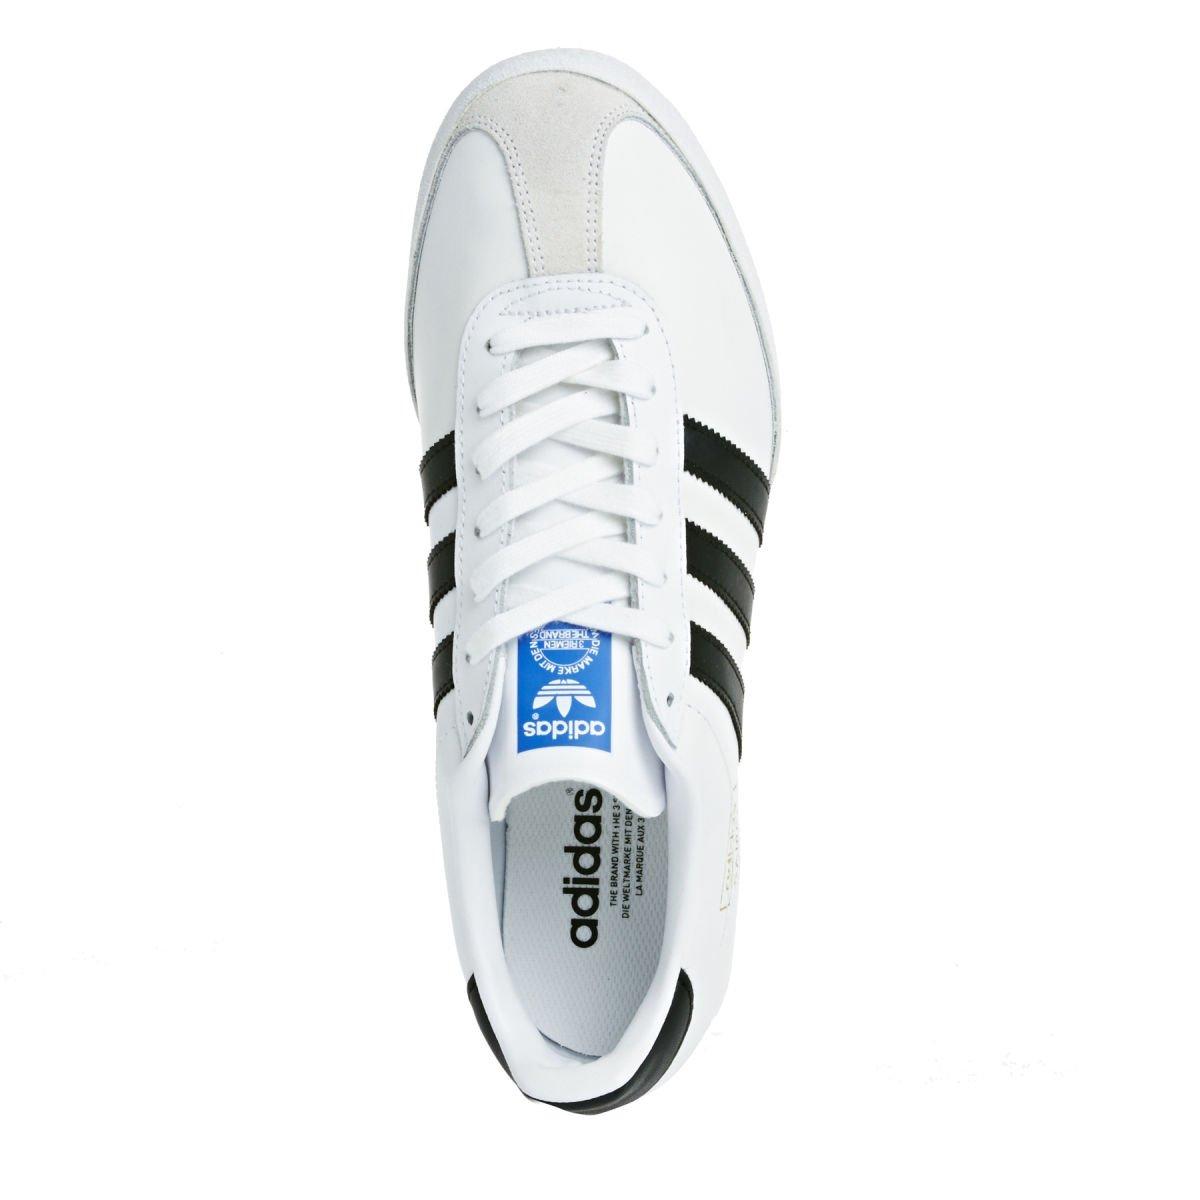 buy popular 8db74 473fa adidas Bamba, Herren Sneaker Weiß WeißSchwarz Amazon.de Schuhe   Handtaschen